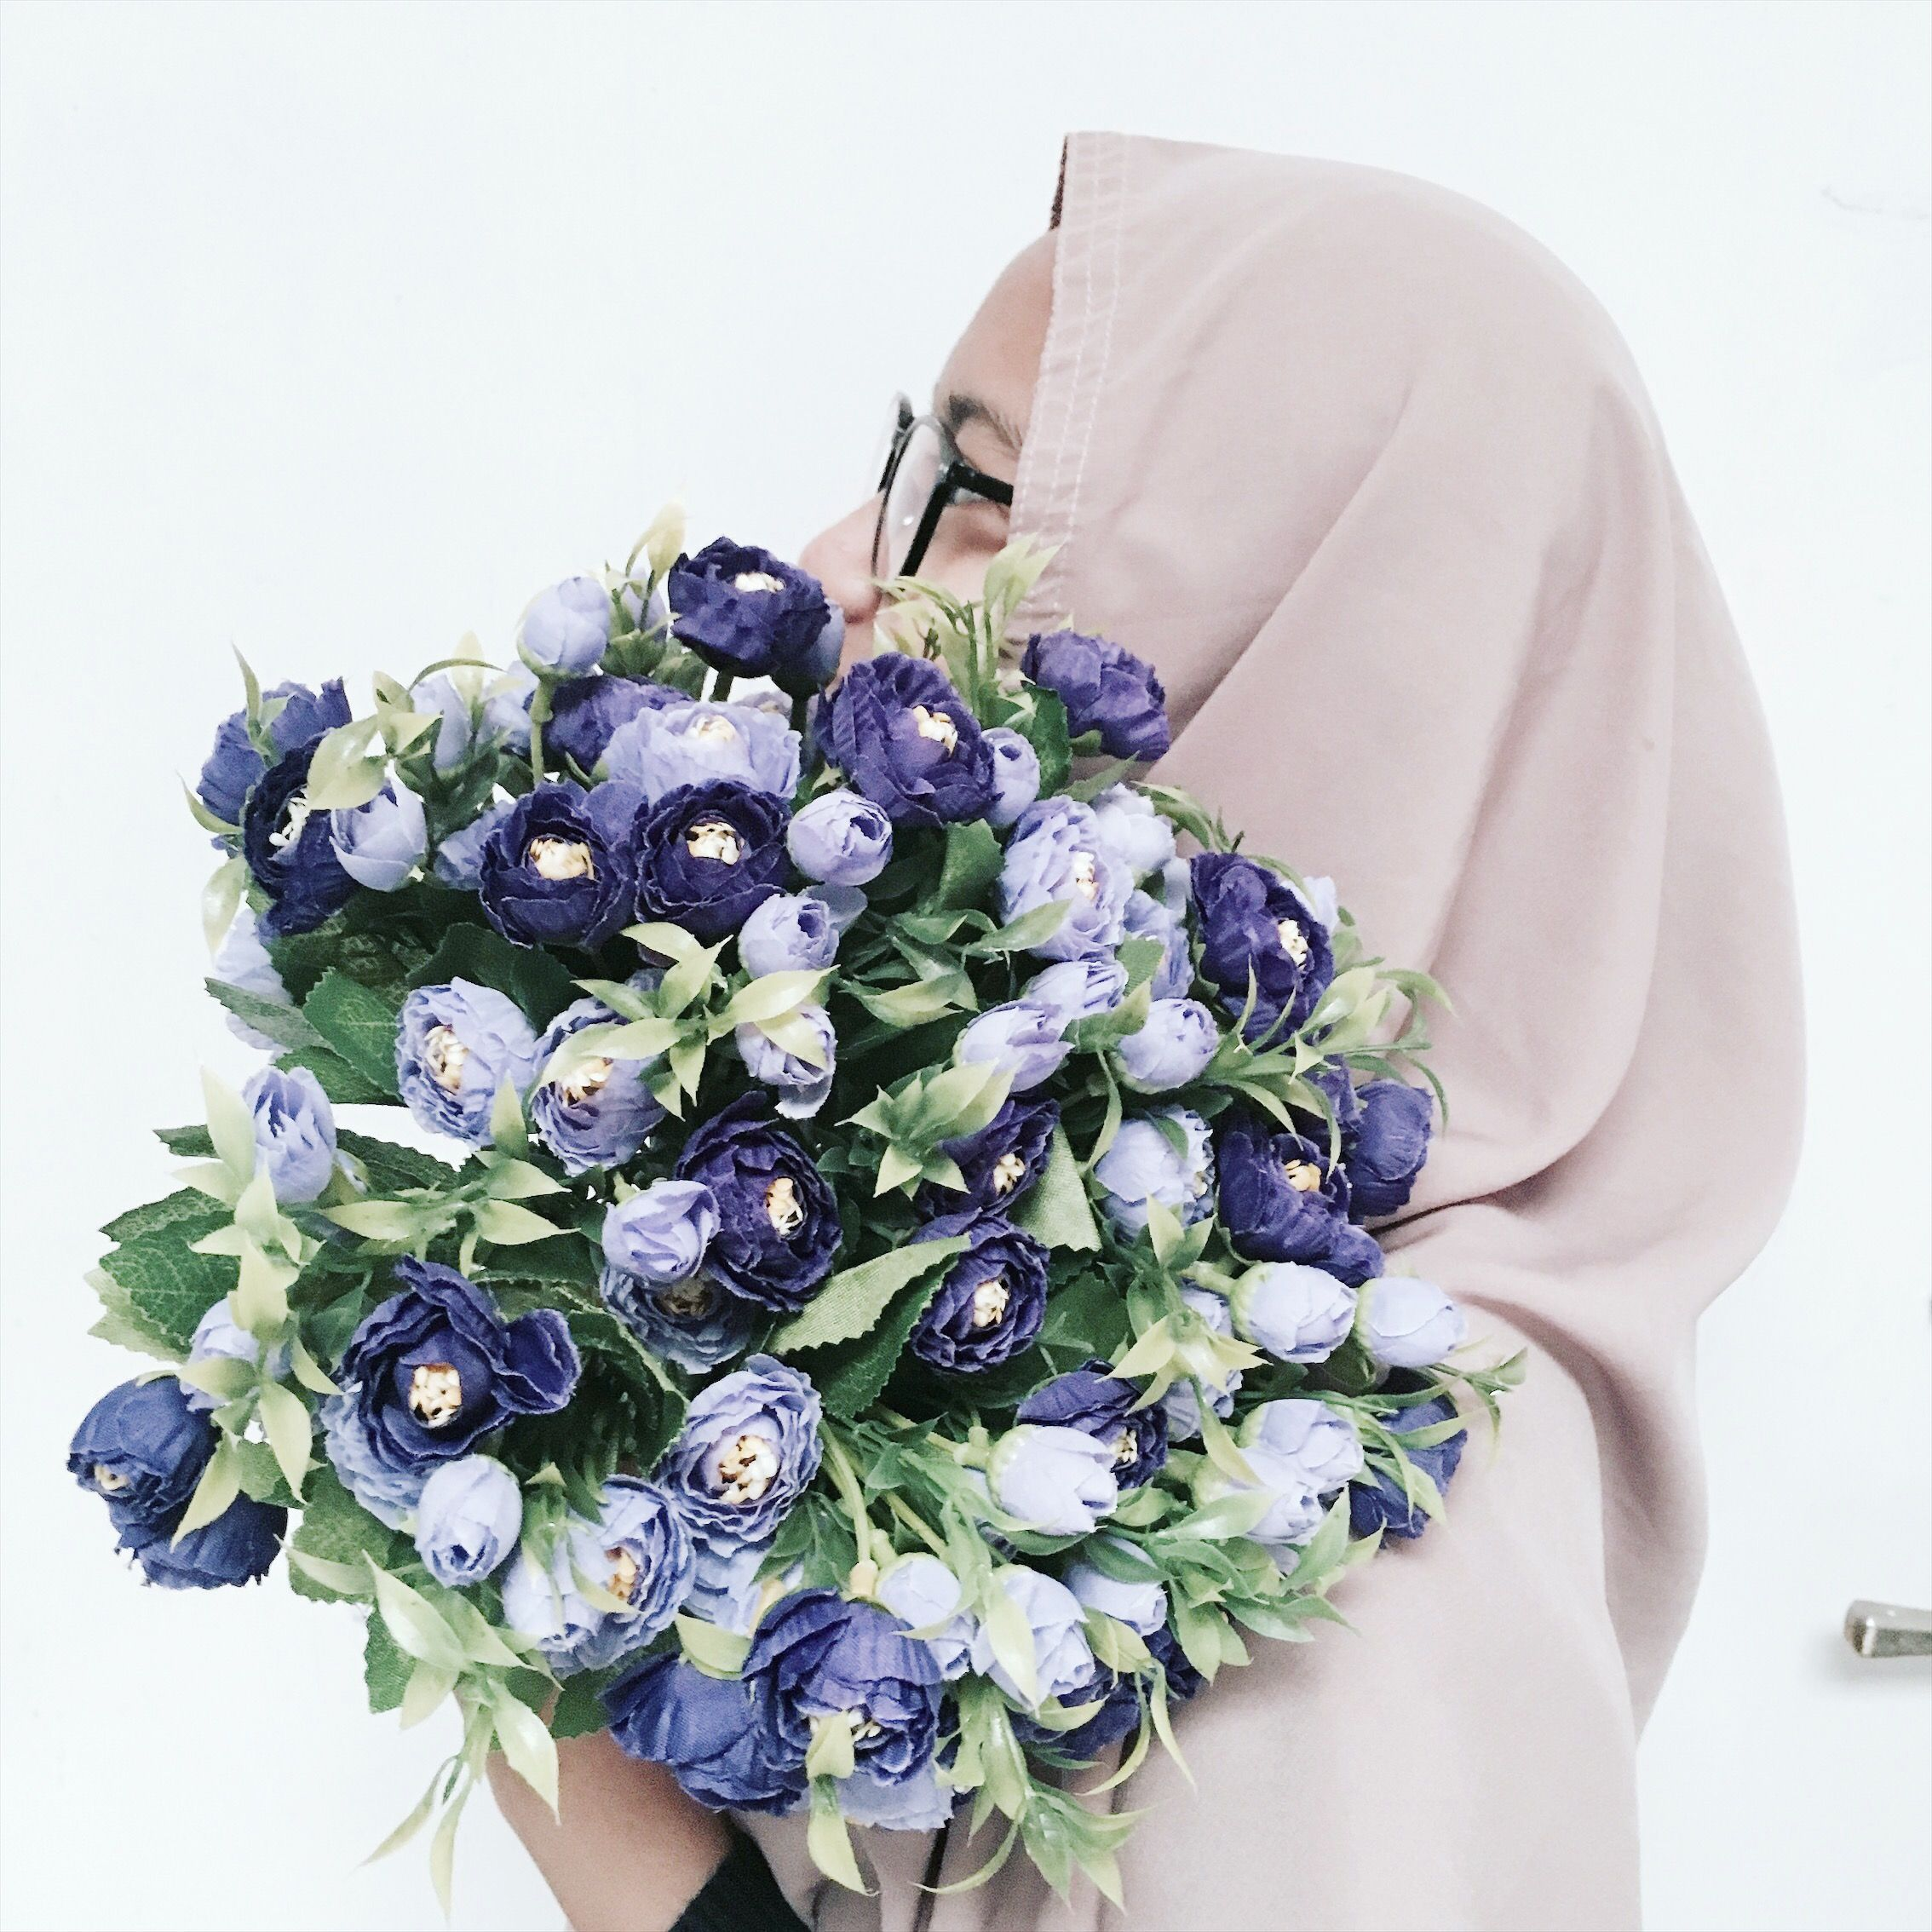 Flowers hijab beauty muslim moeslem love tumblr